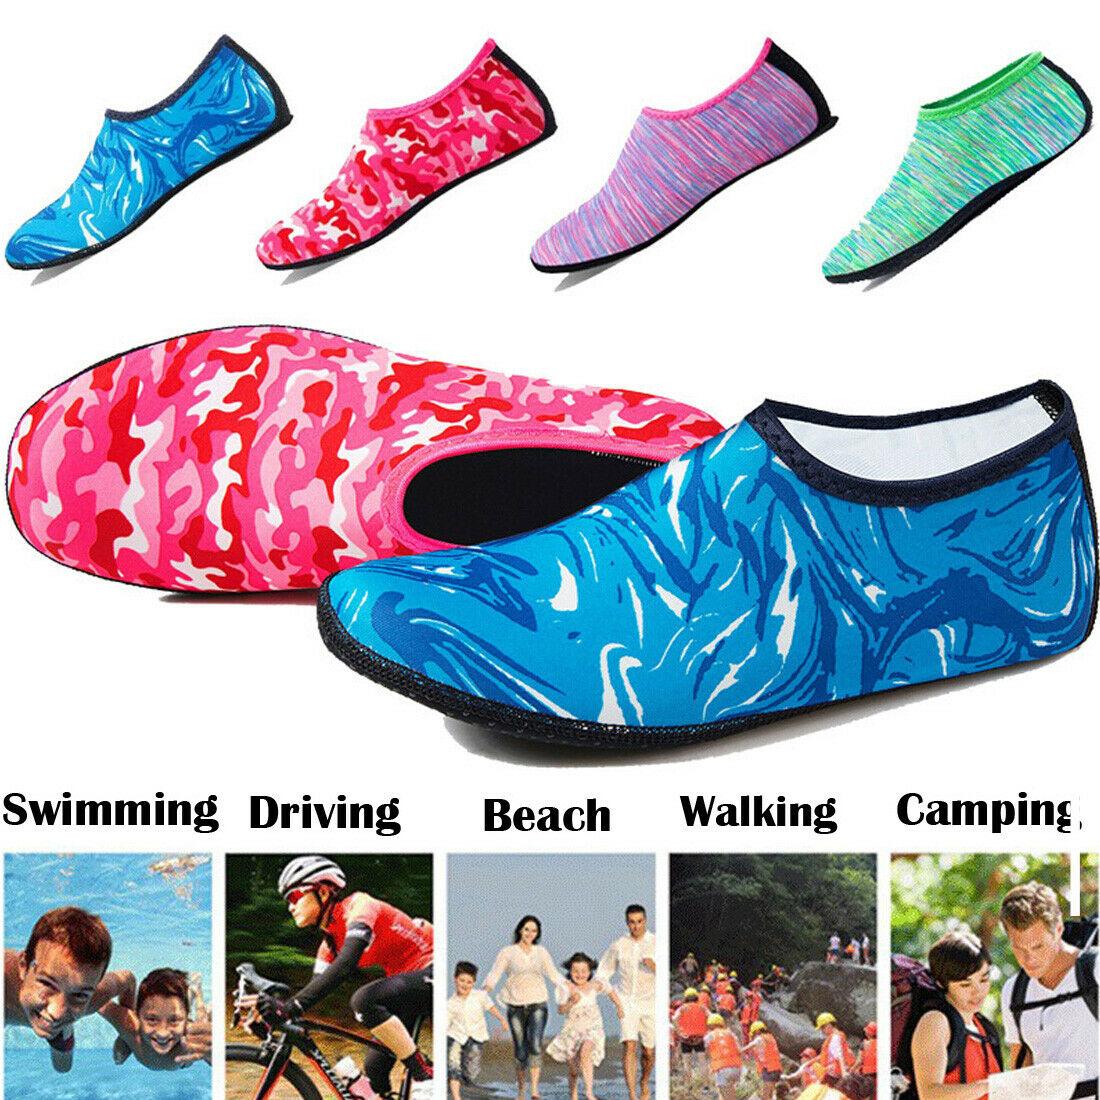 2019 New Unisex Barefoot Water Skin Shoes Aqua Socks for Beach Swim Surf Yoga Exercise Sports Socks